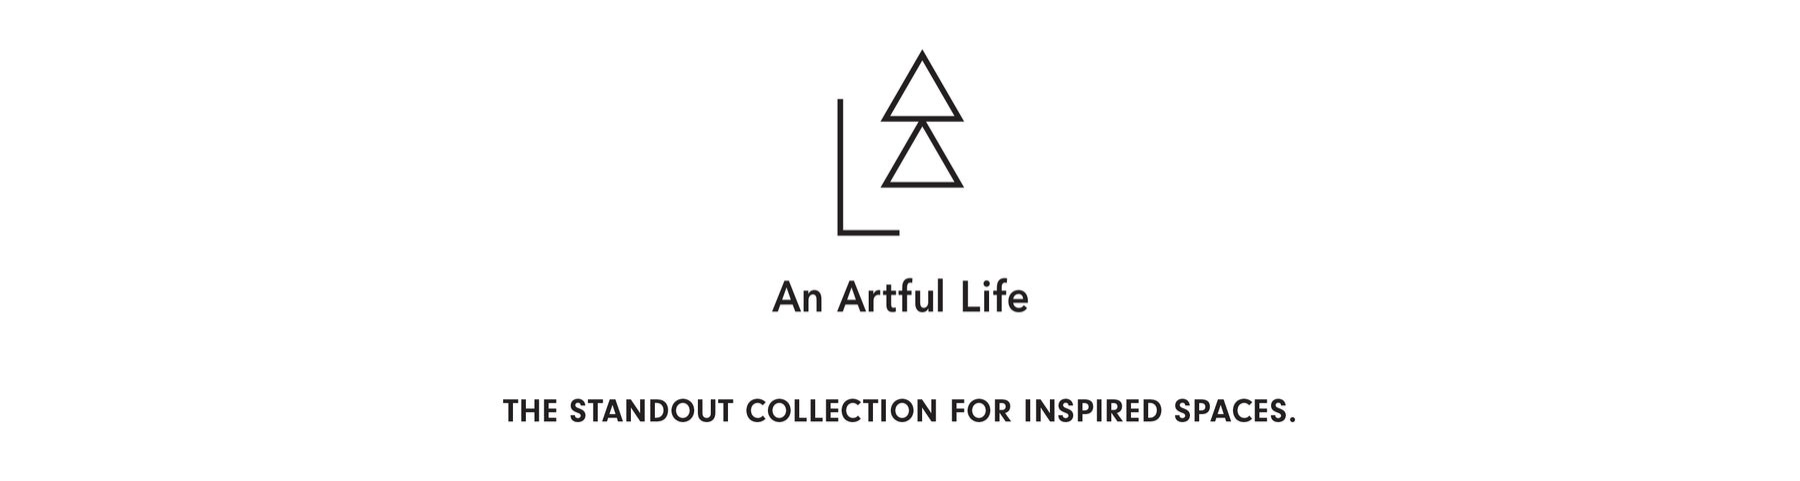 An Artful Life